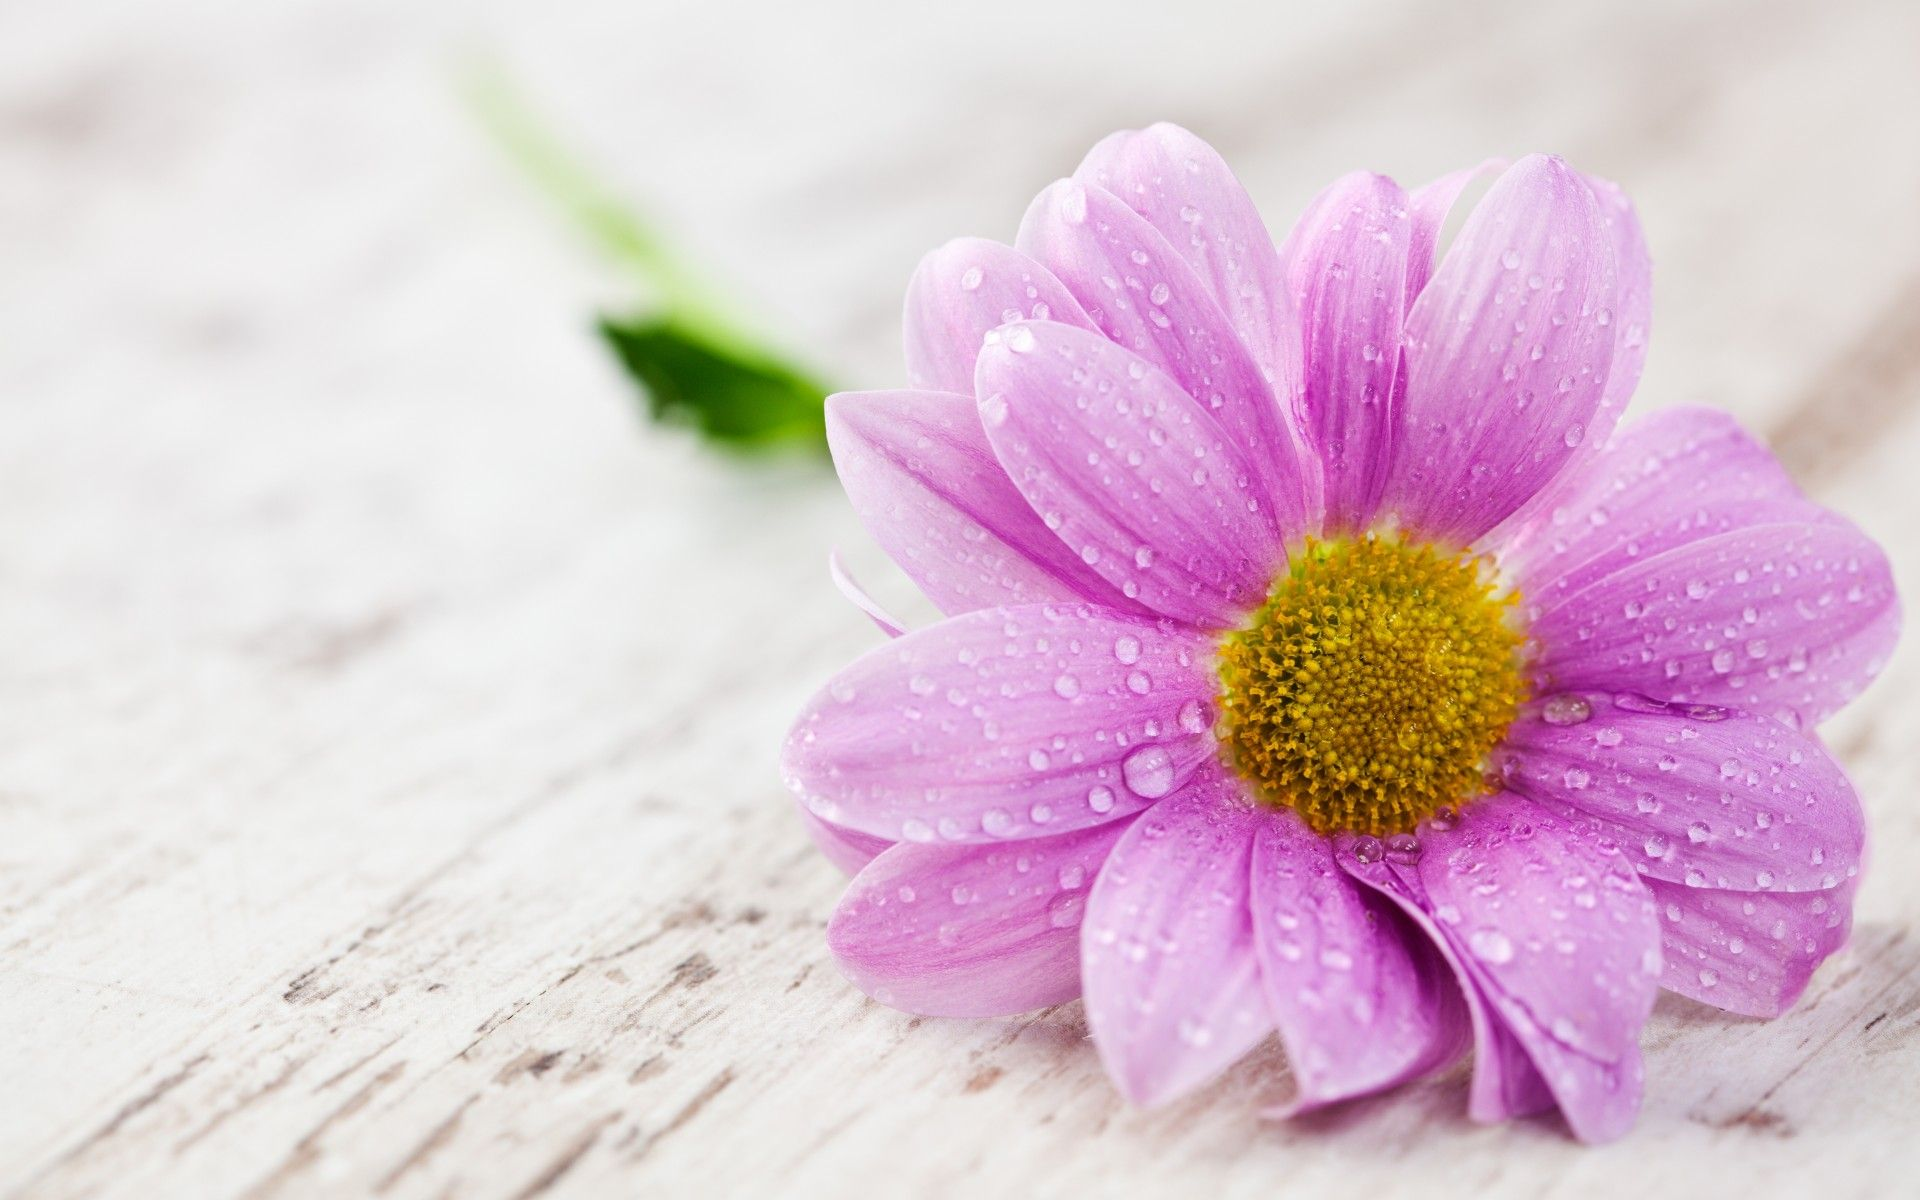 Hermosas Flores Blancas Wallpaper Hd Fondos De Pantalla Gratis: Flower Drops Water Petals Table G Wallpaper